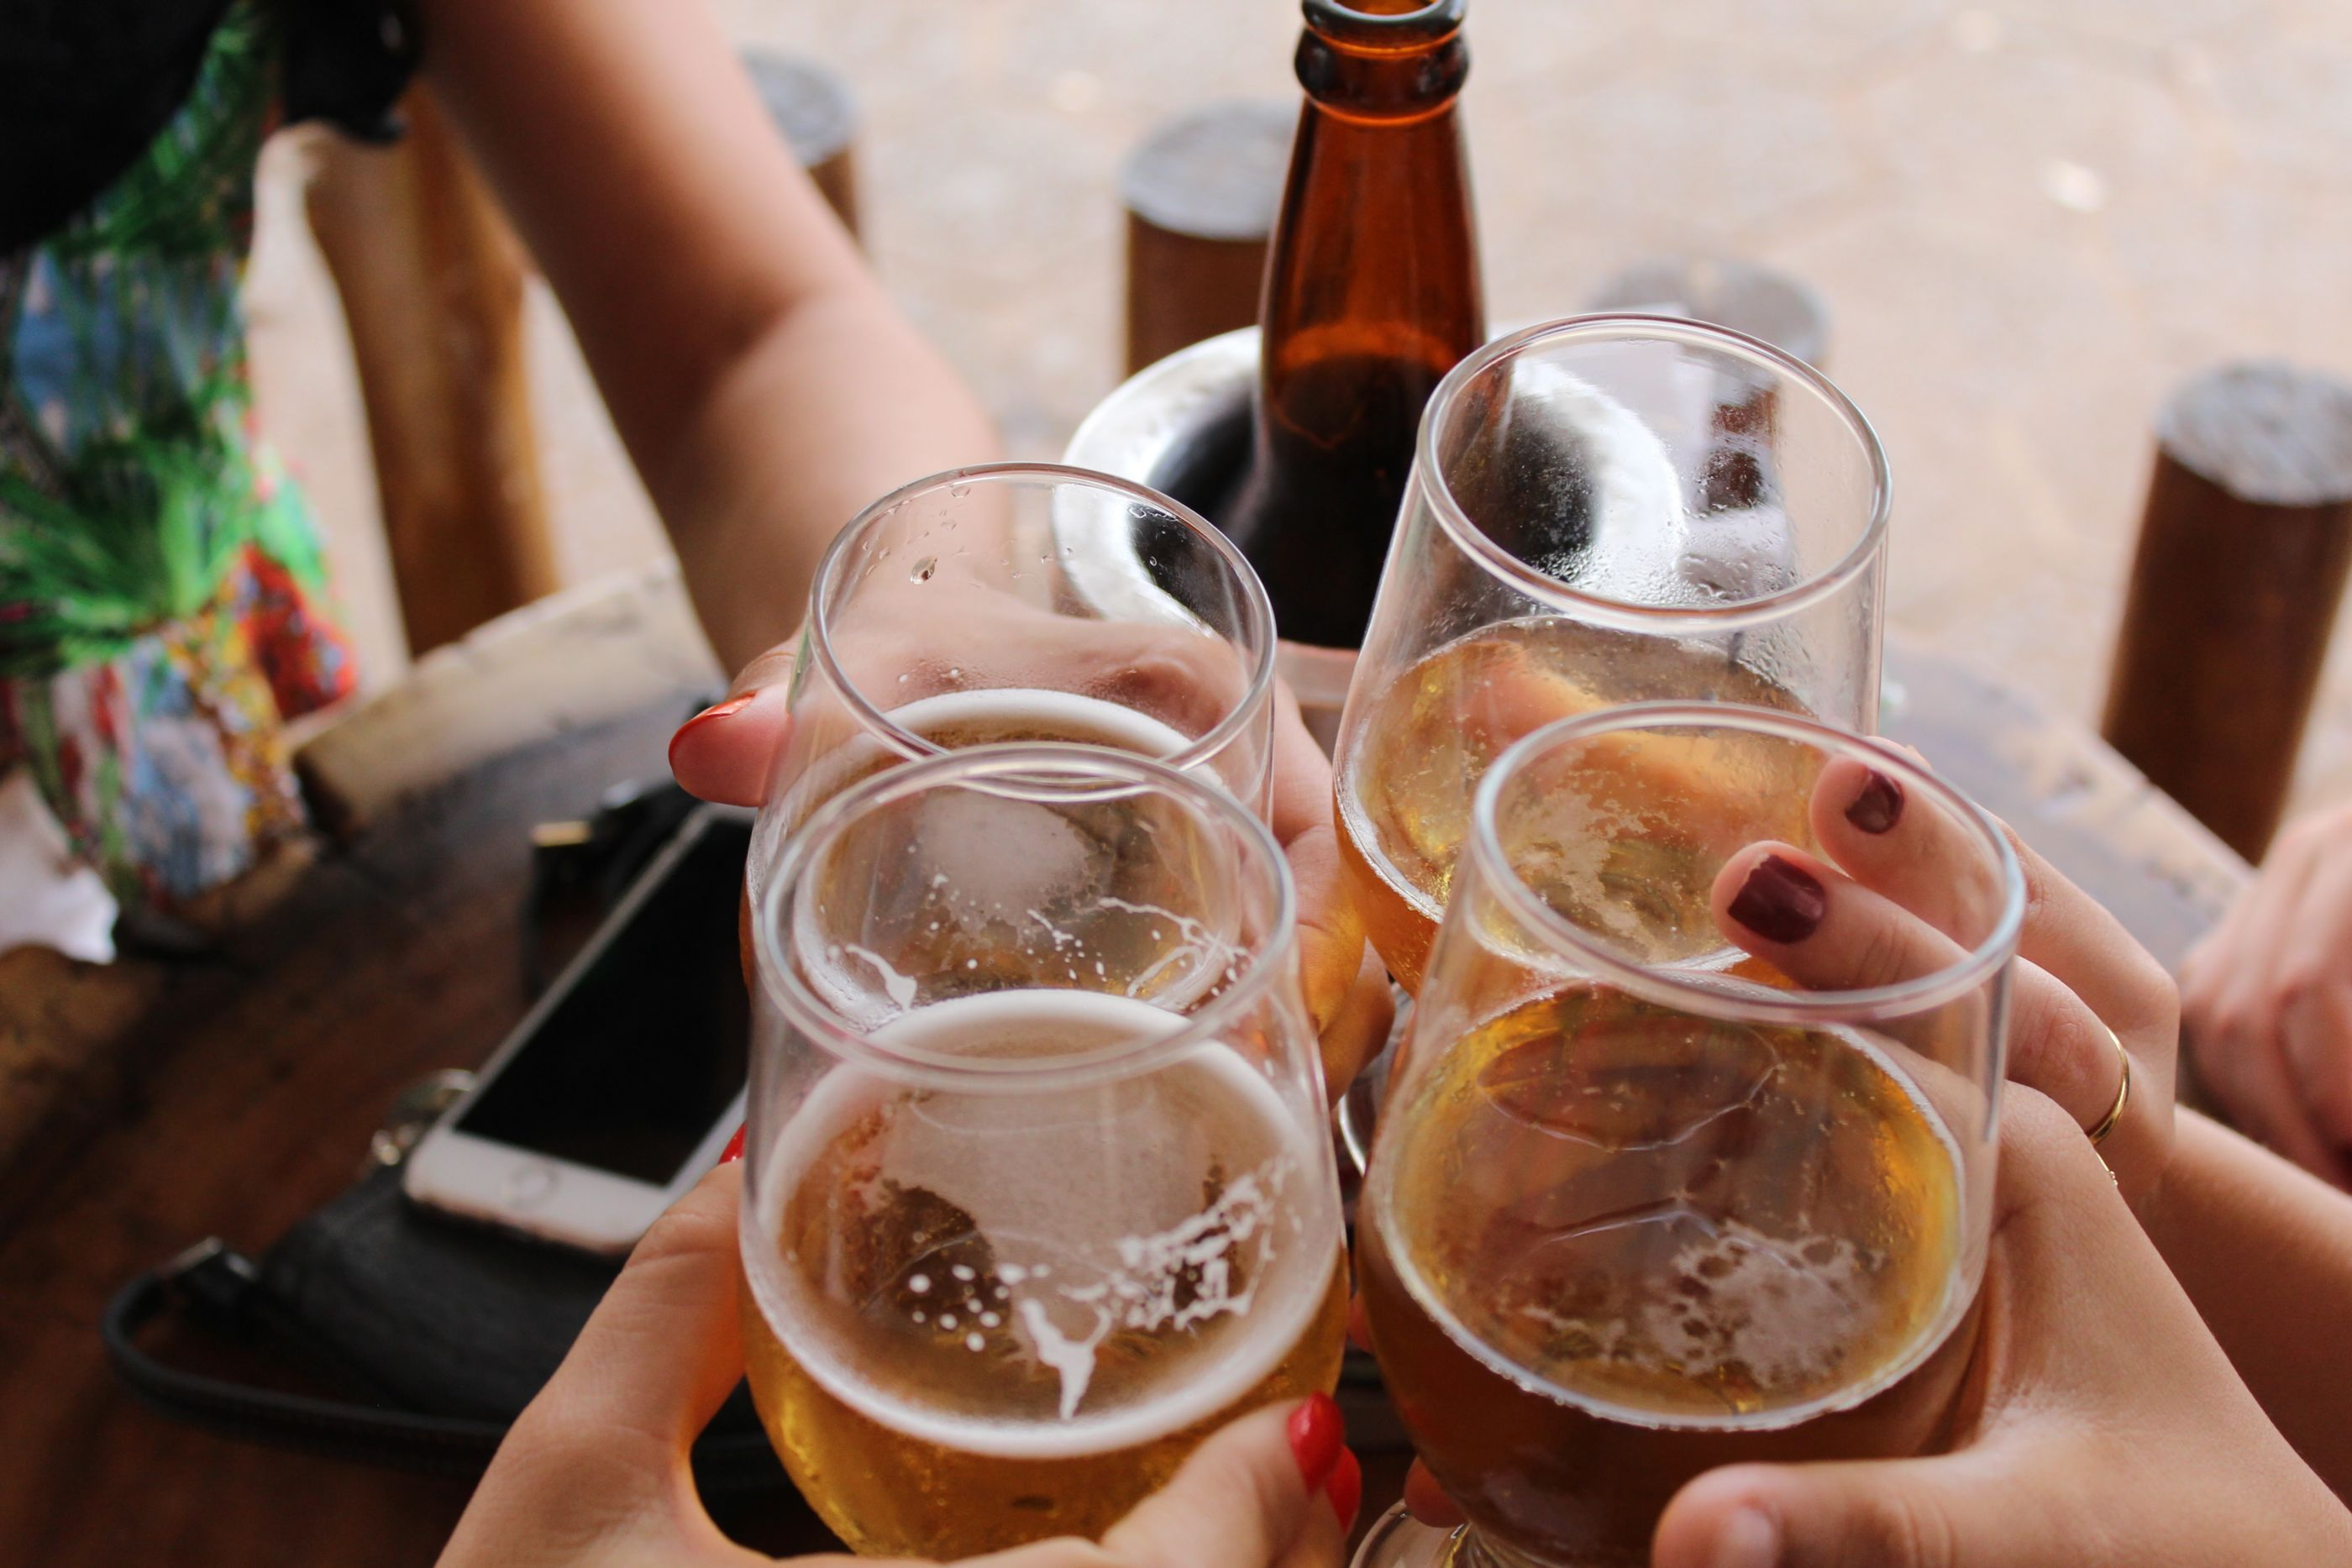 El brunch sabe mejor con cerveza artesanal